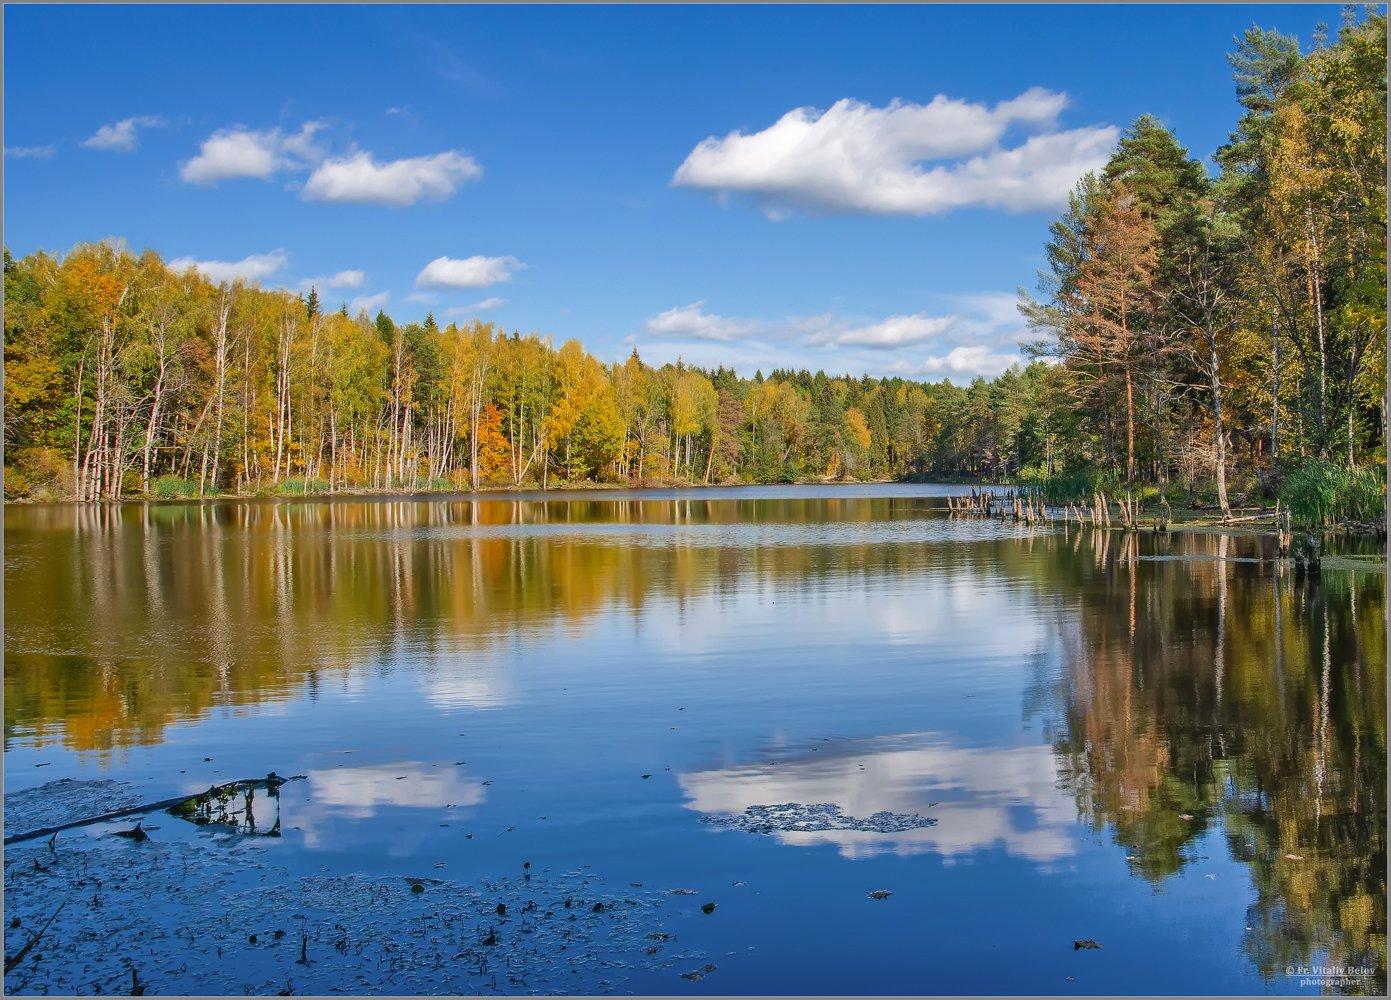 Осенние краски (снимок сделан 28 сентября 2014 г.)